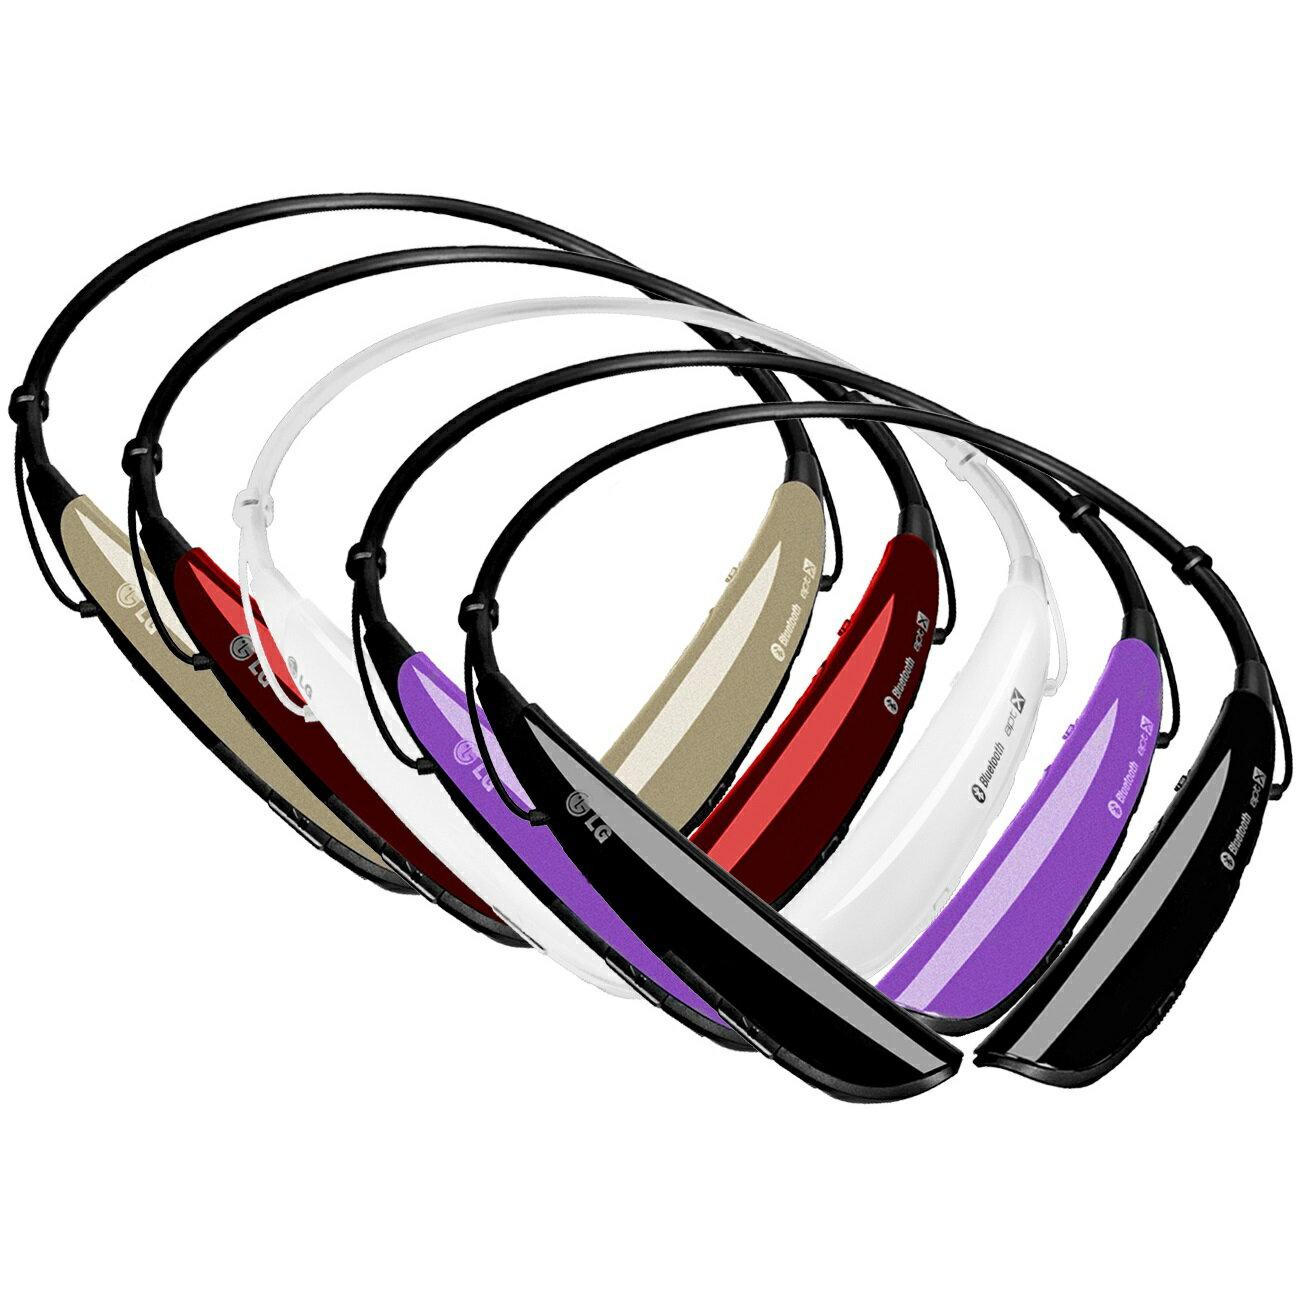 LG Tone Pro HBS-750 Wireless Bluetooth Stereo Headset HBS750